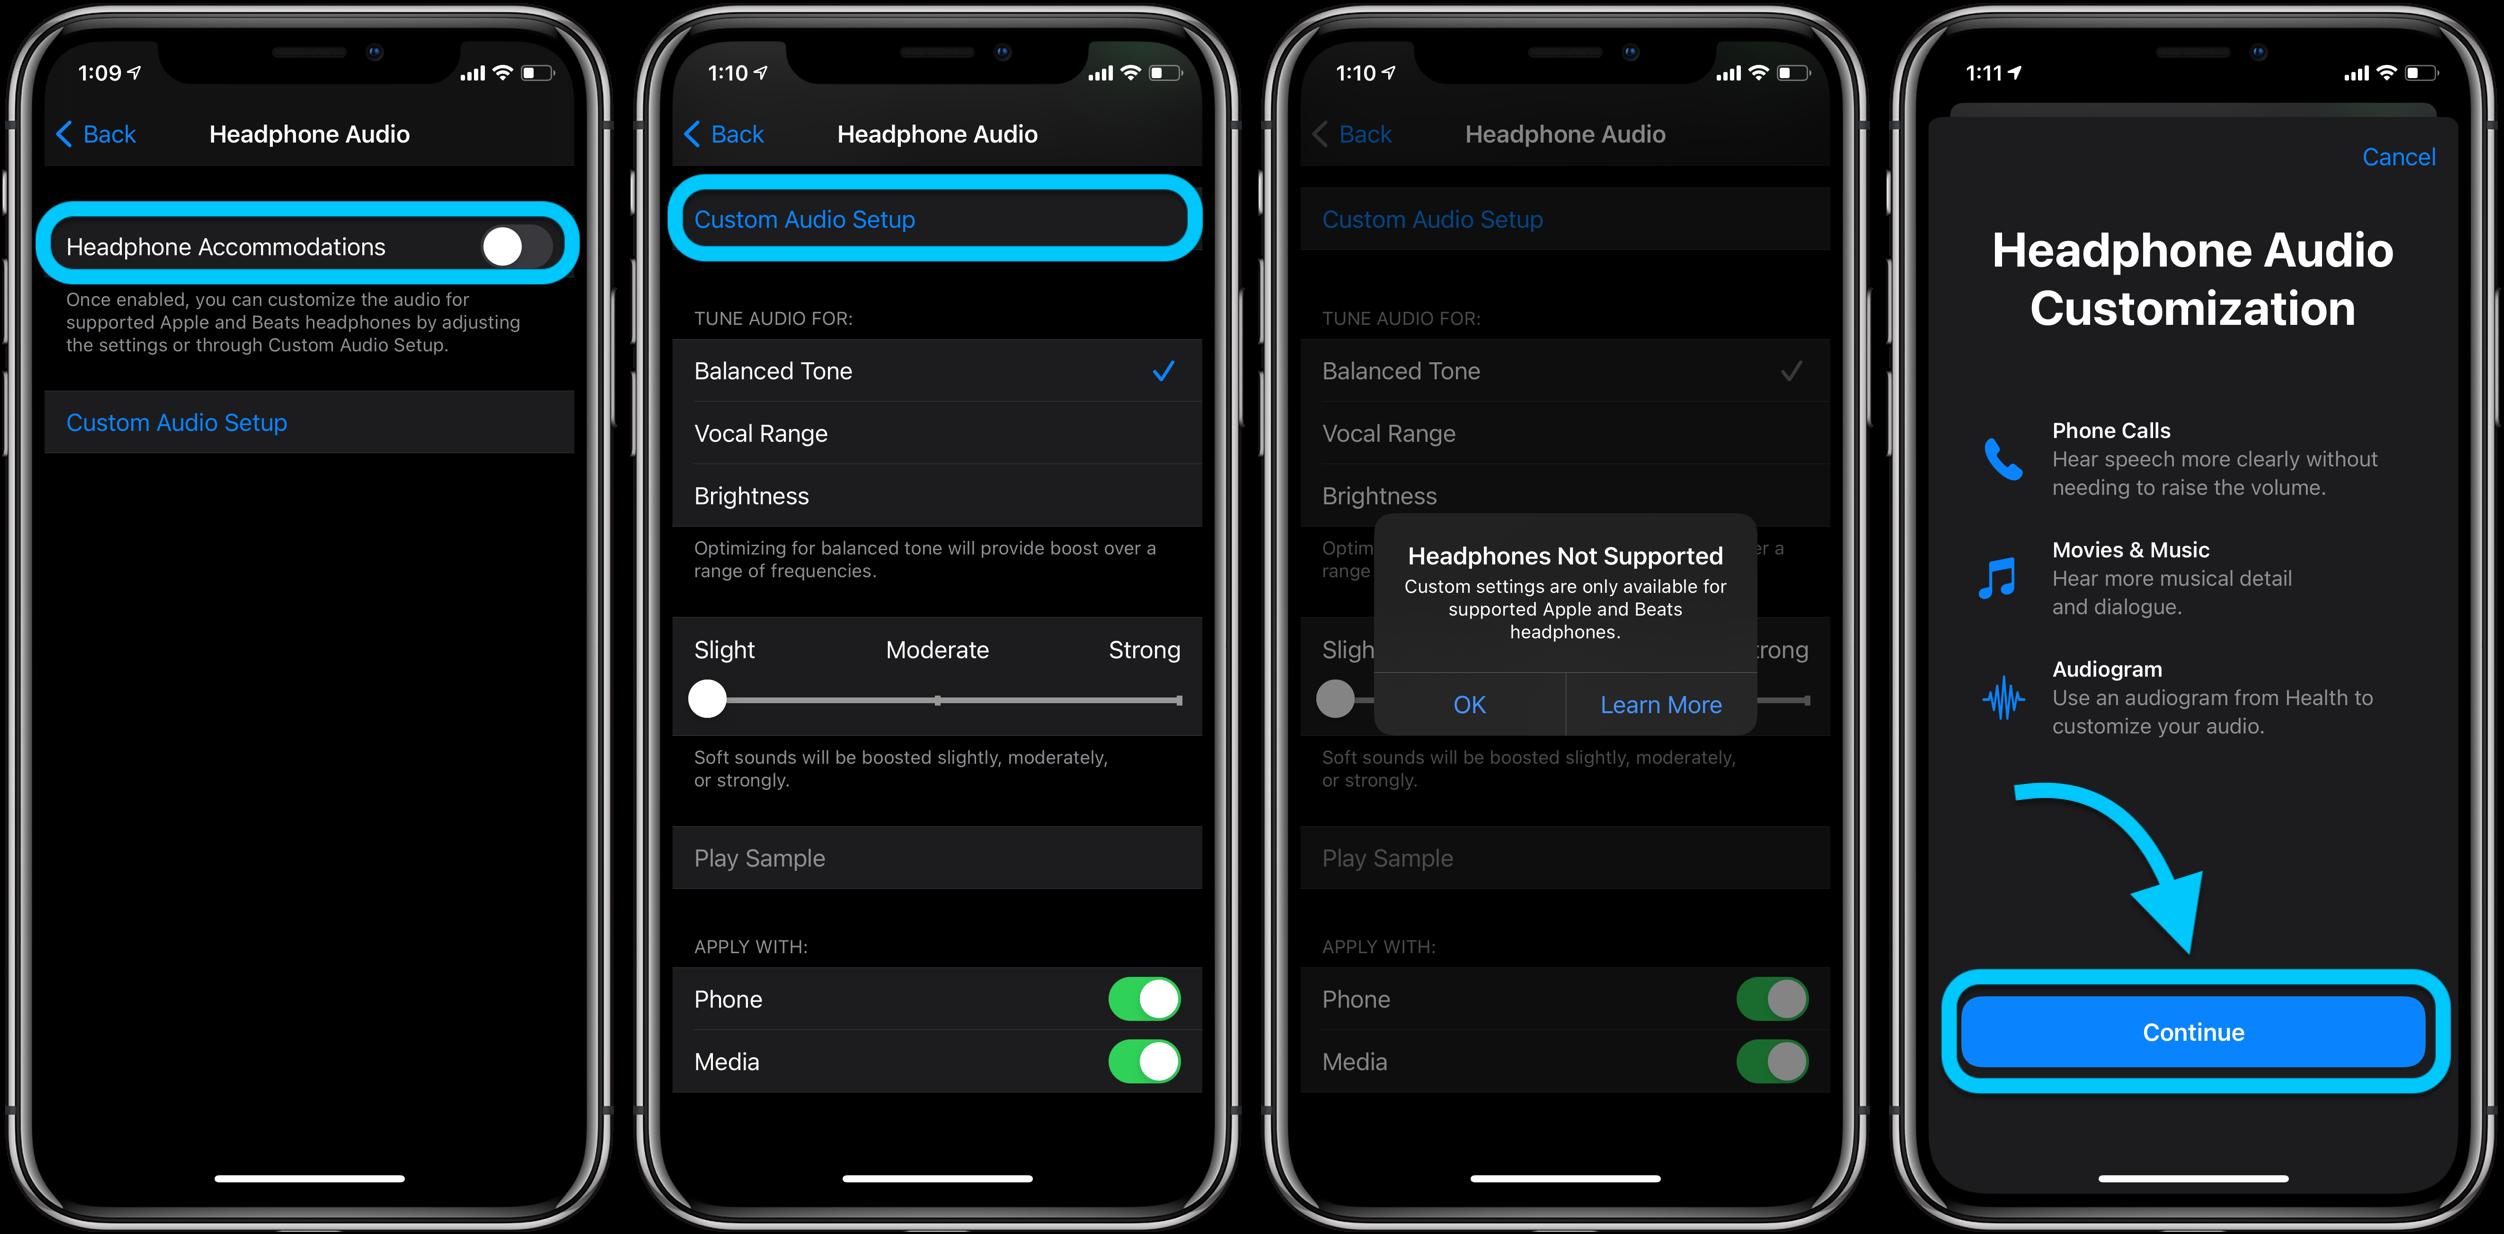 How to customize iPhone headphone audio in iOS 14 walkthrough 2